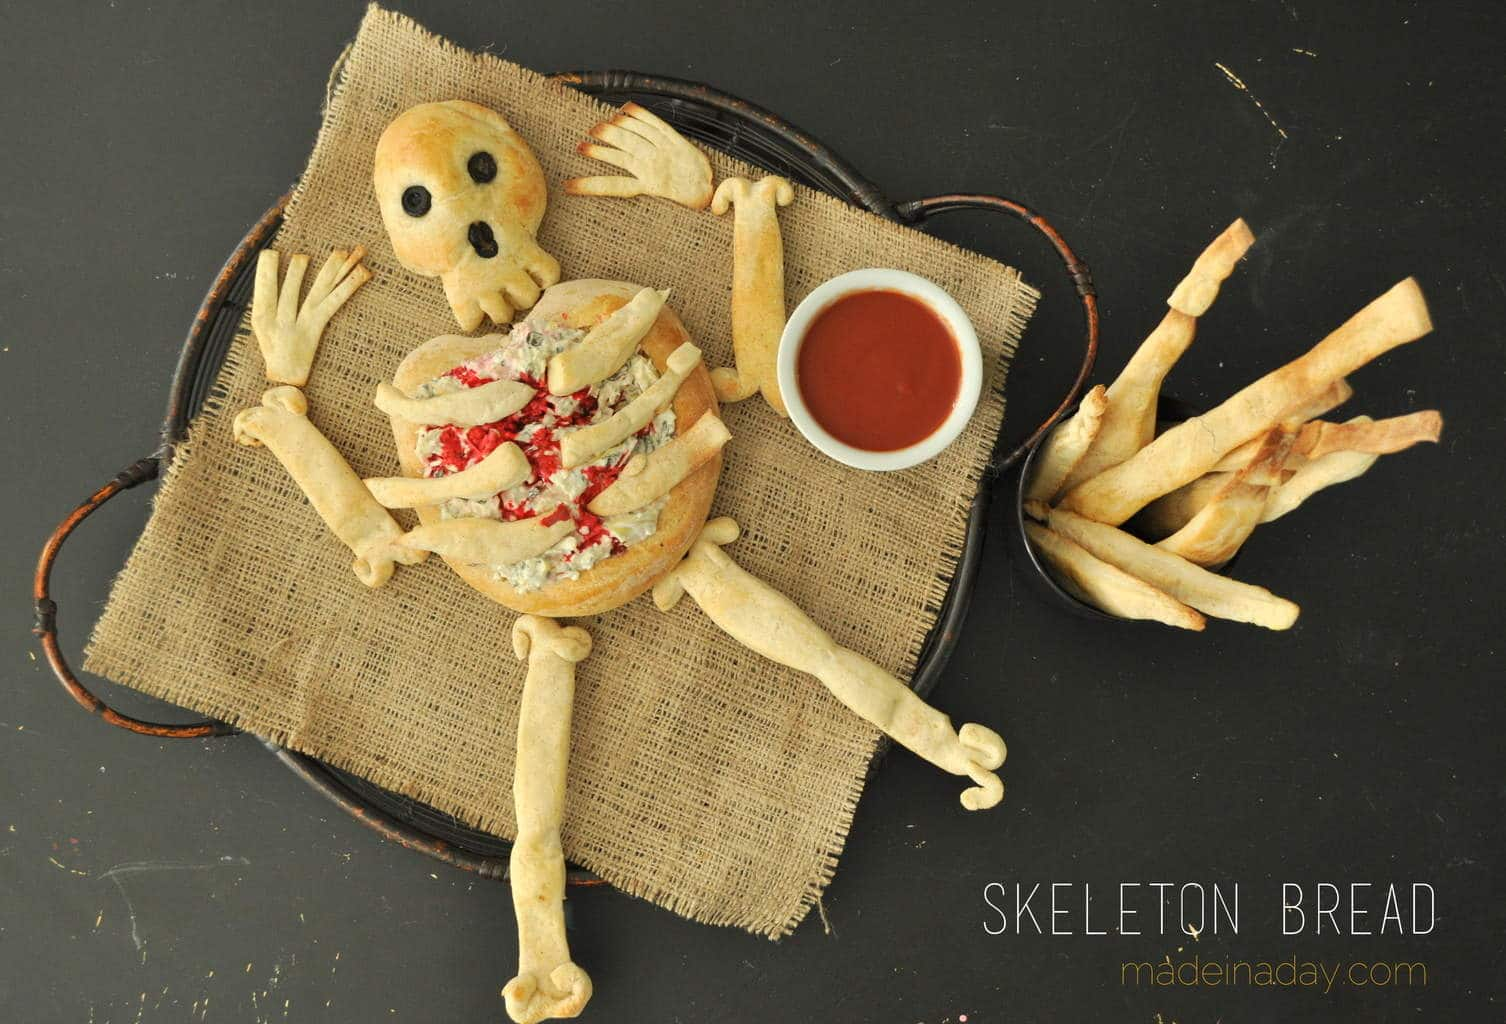 Skeleton Bread & Breadsticks madeinaday.com